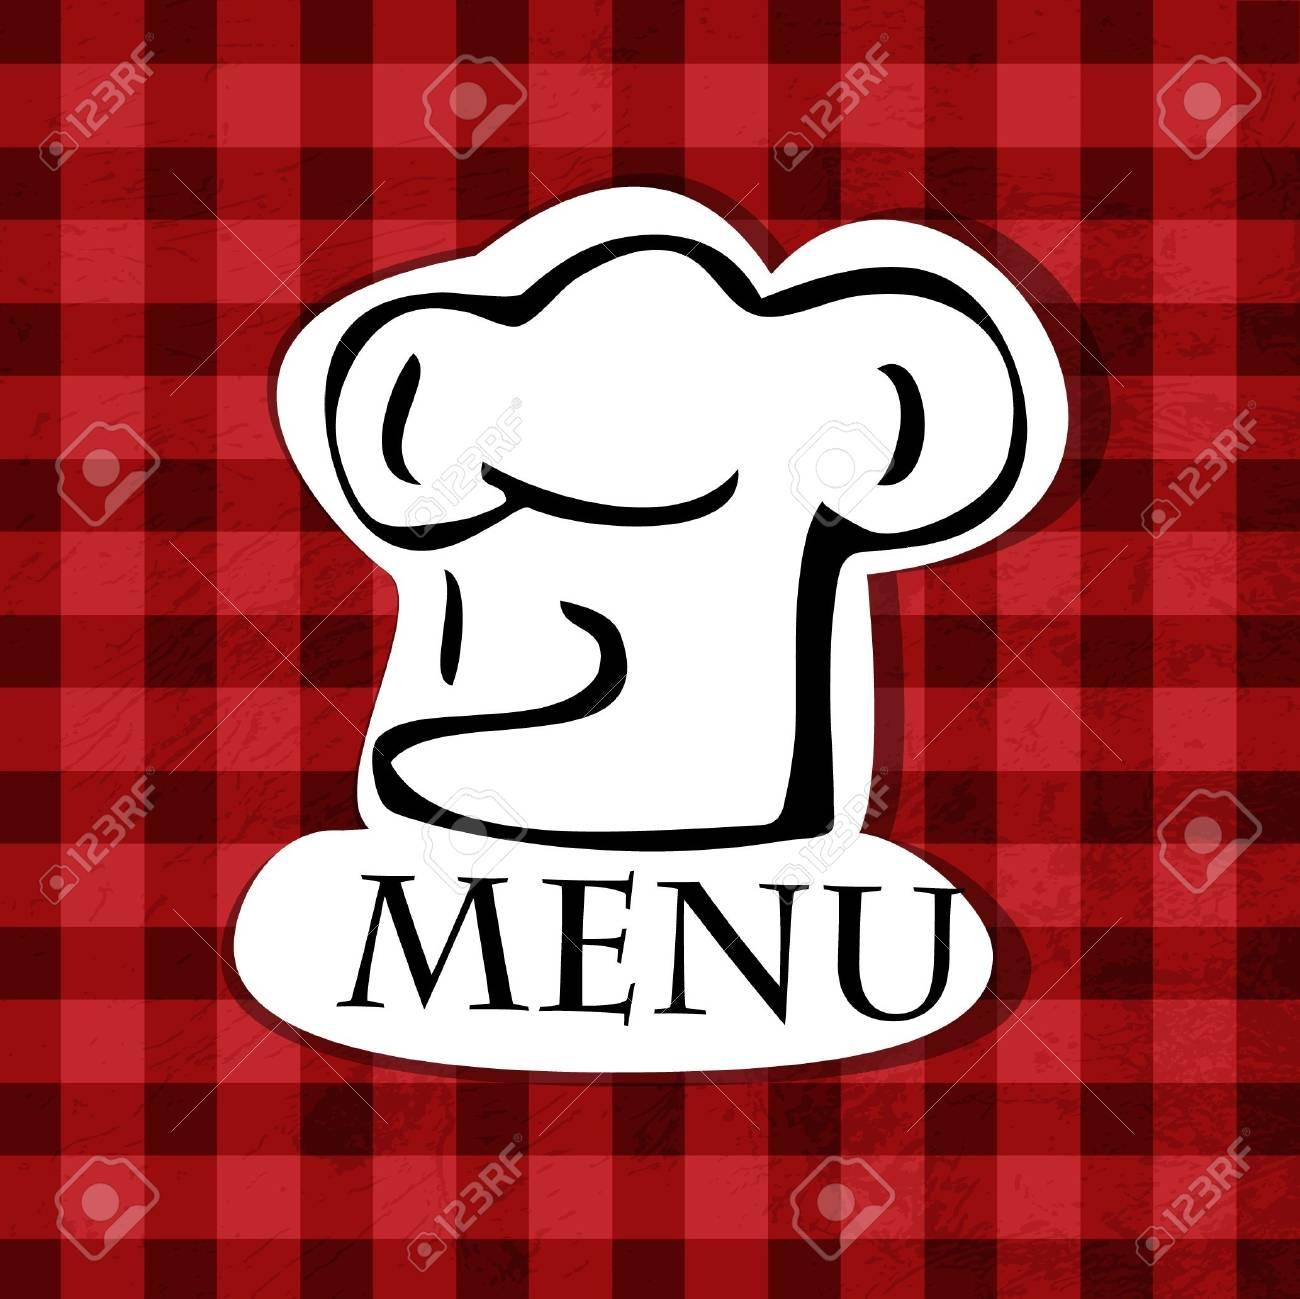 restaurant menu design Stock Vector - 12658643